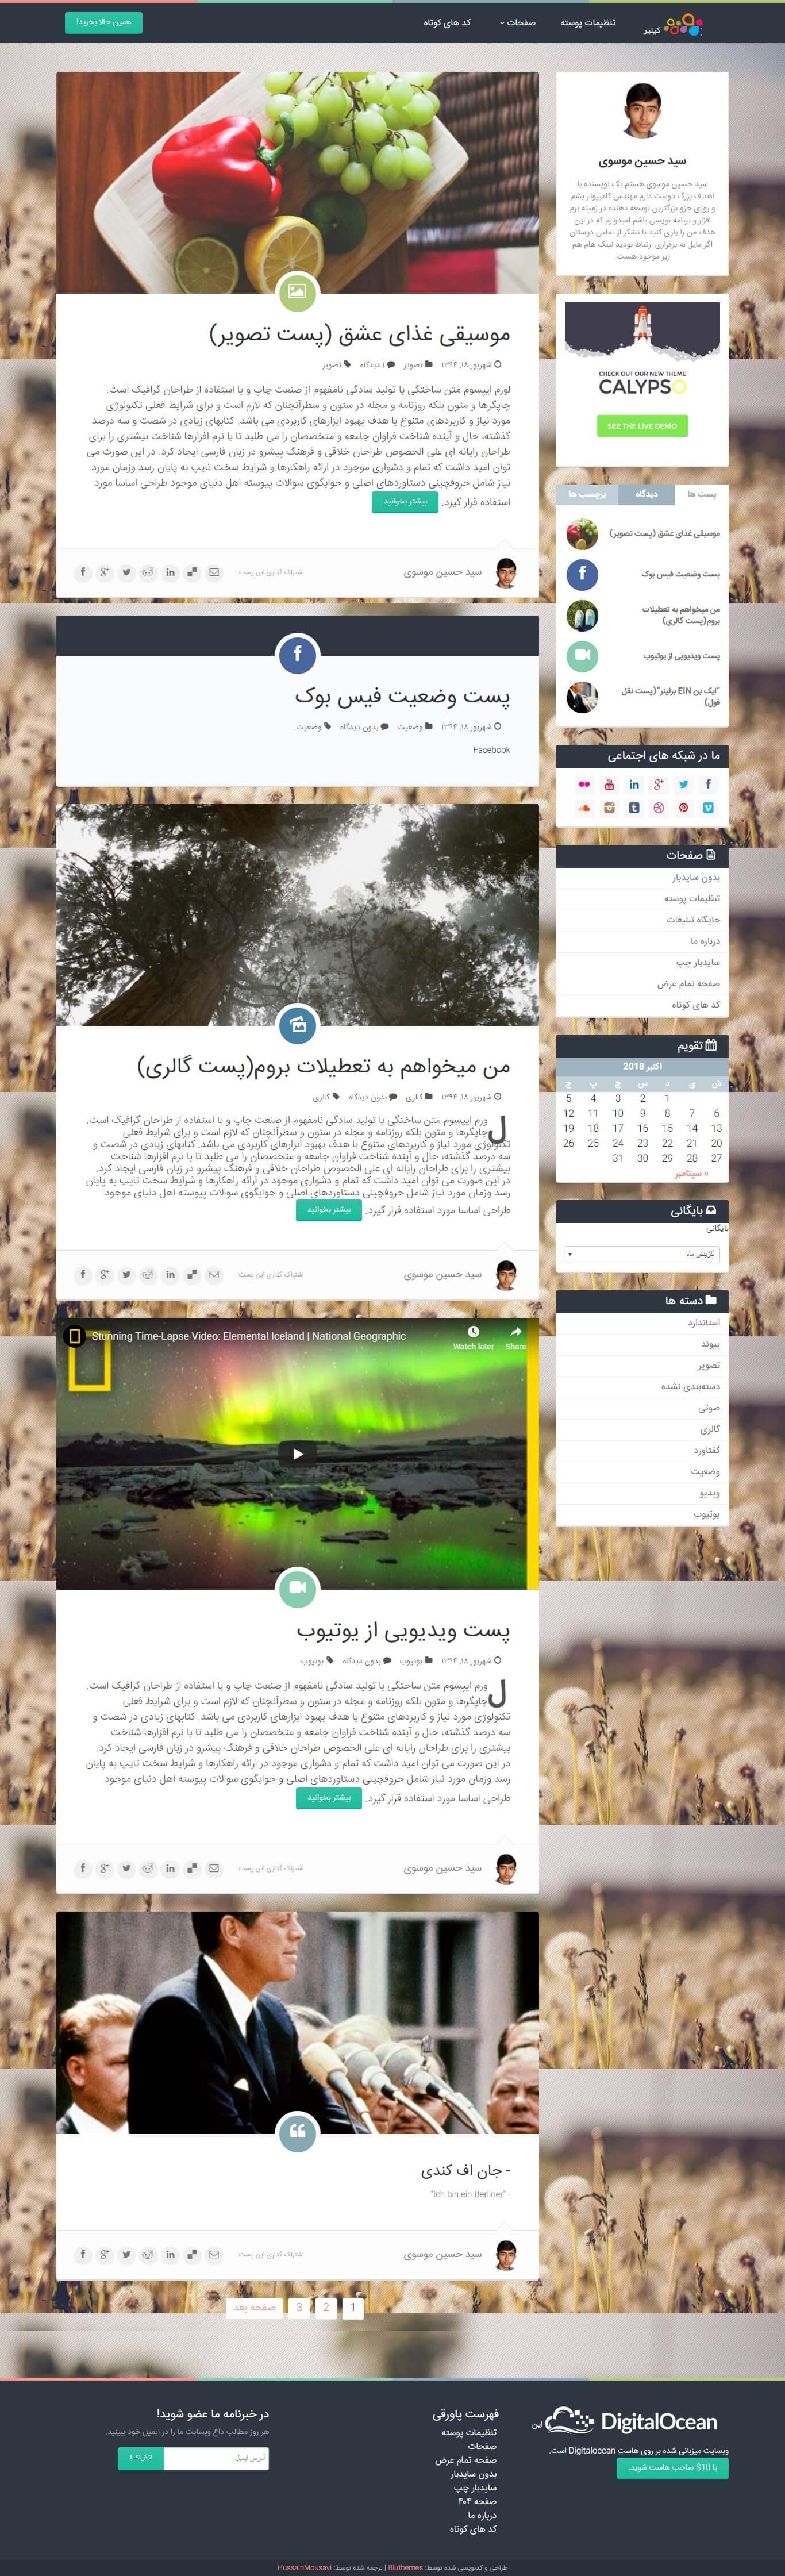 کیلیر | Keilir - قالب وبلاگ وردپرس شخصی